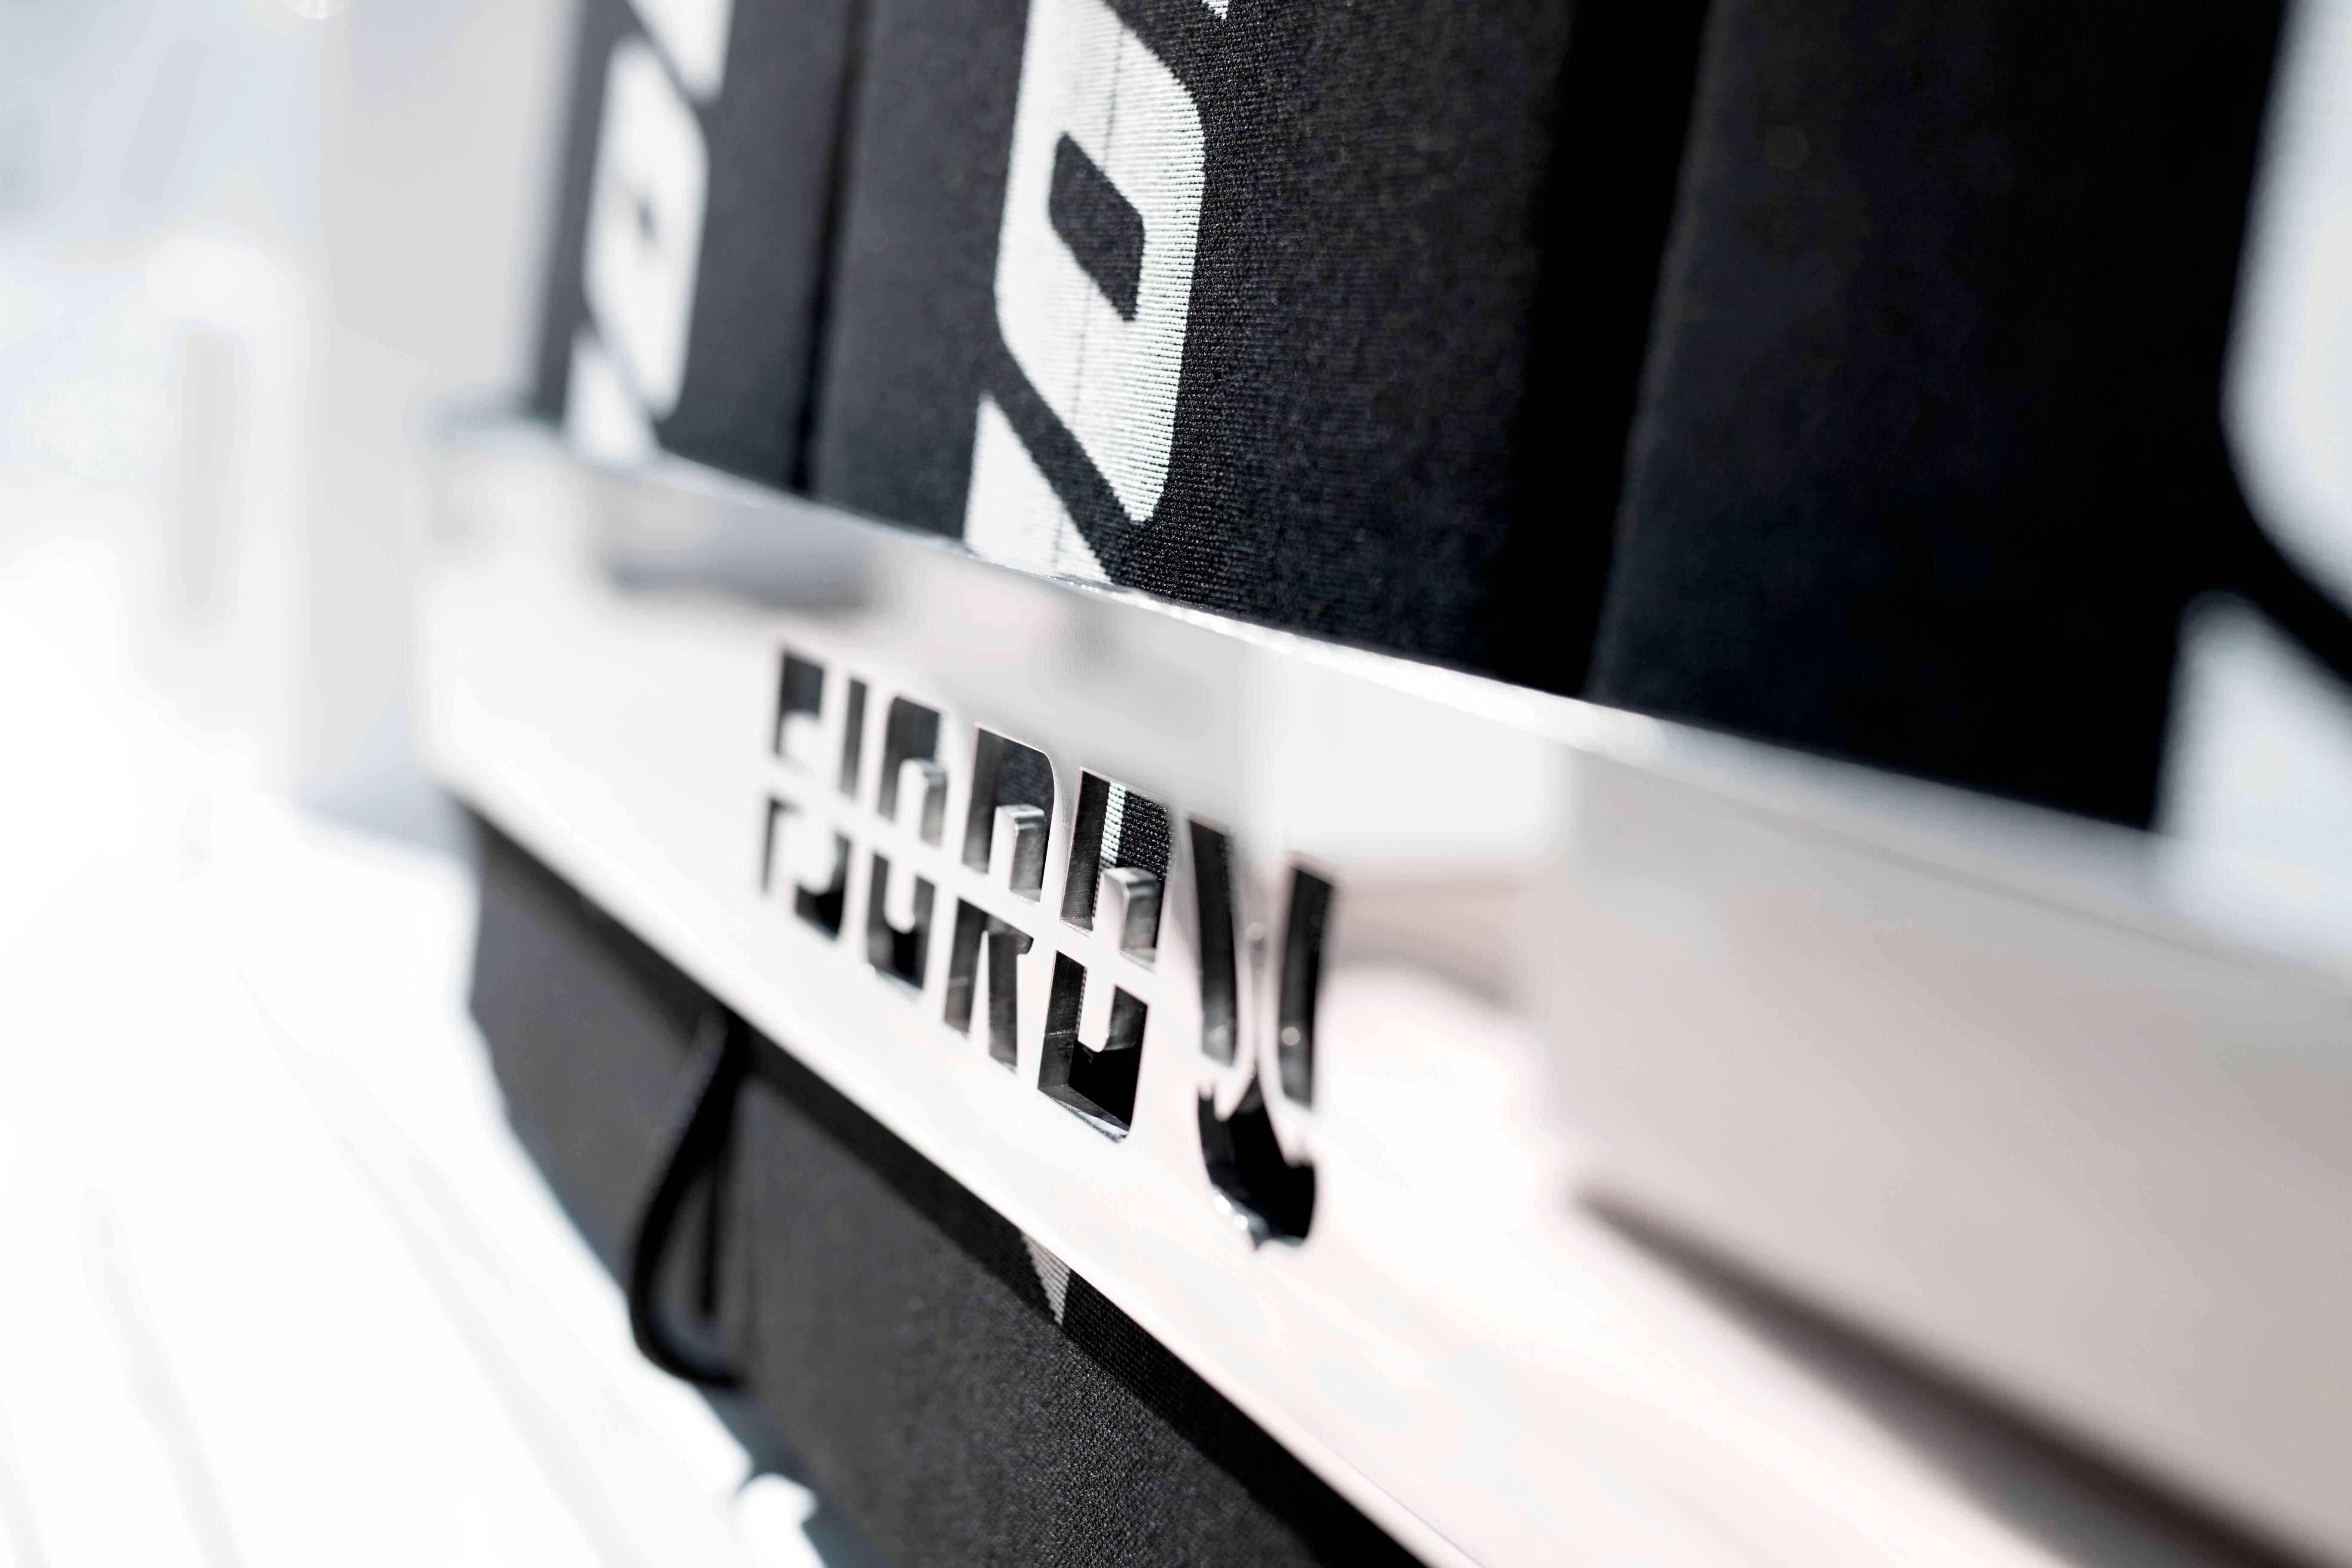 Fjord 38 xpress | Fenderaufbewahrung aus Edelstahl | Fjord